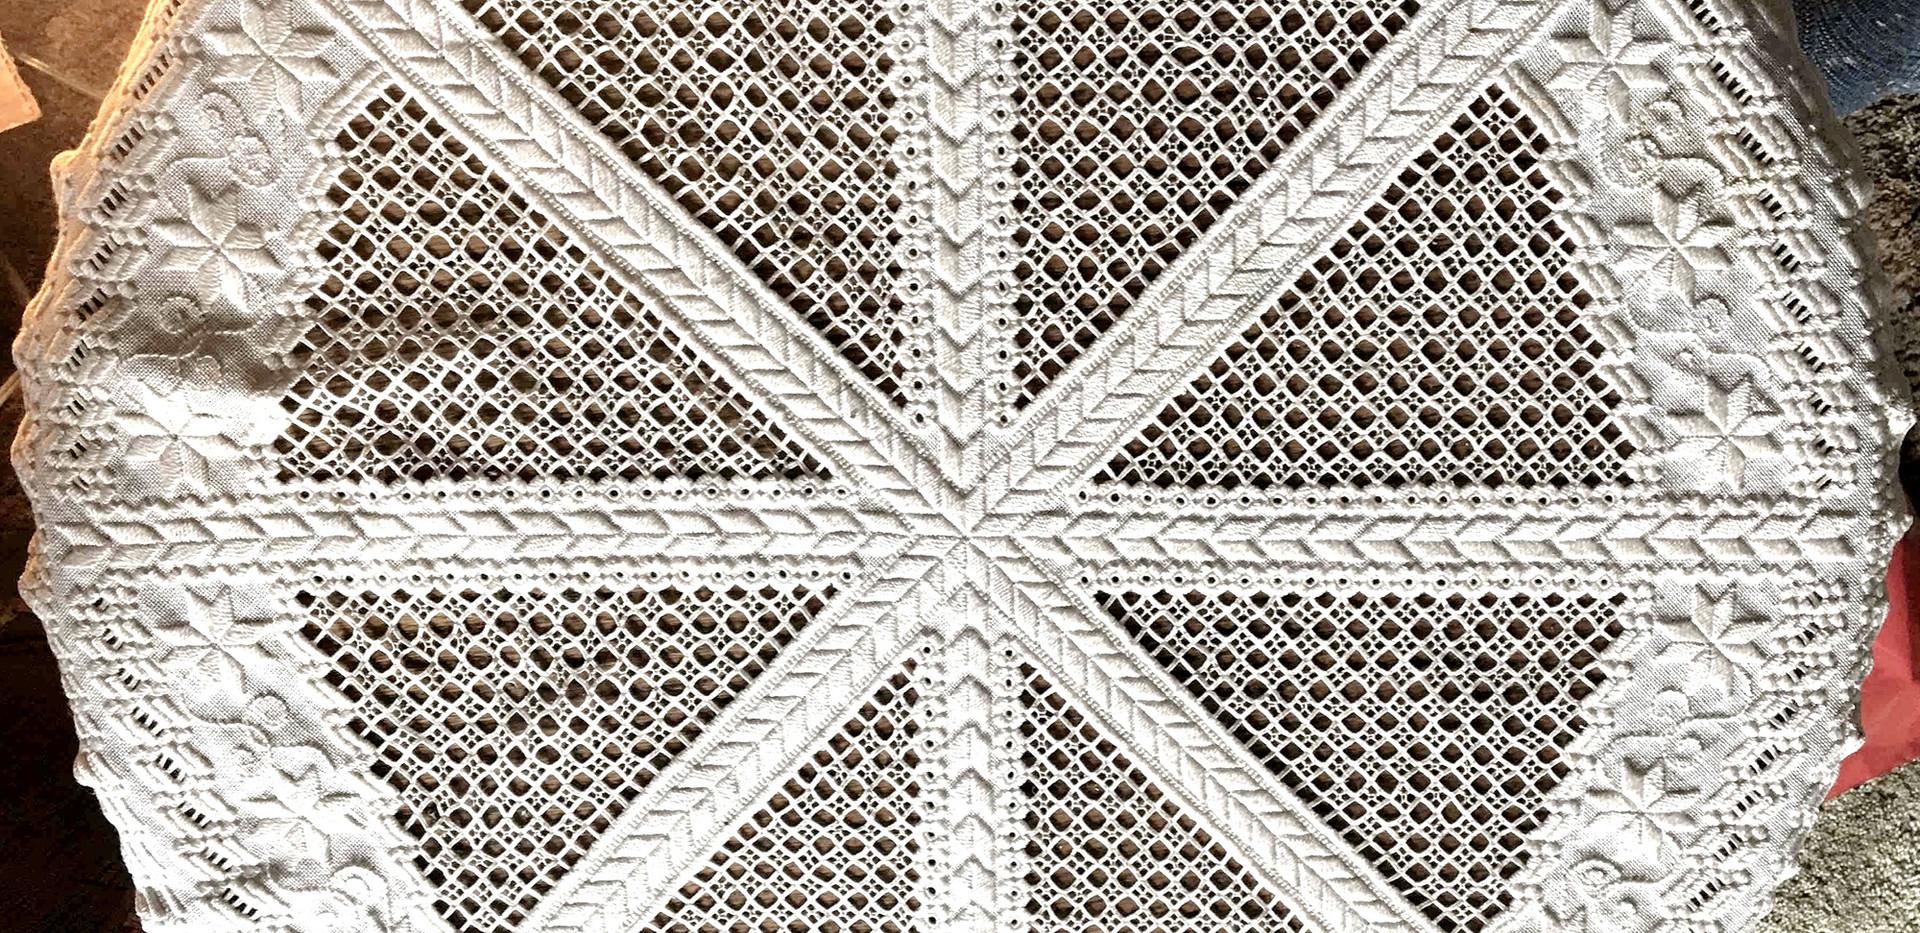 Hardanger Embroidery by Jo Kush